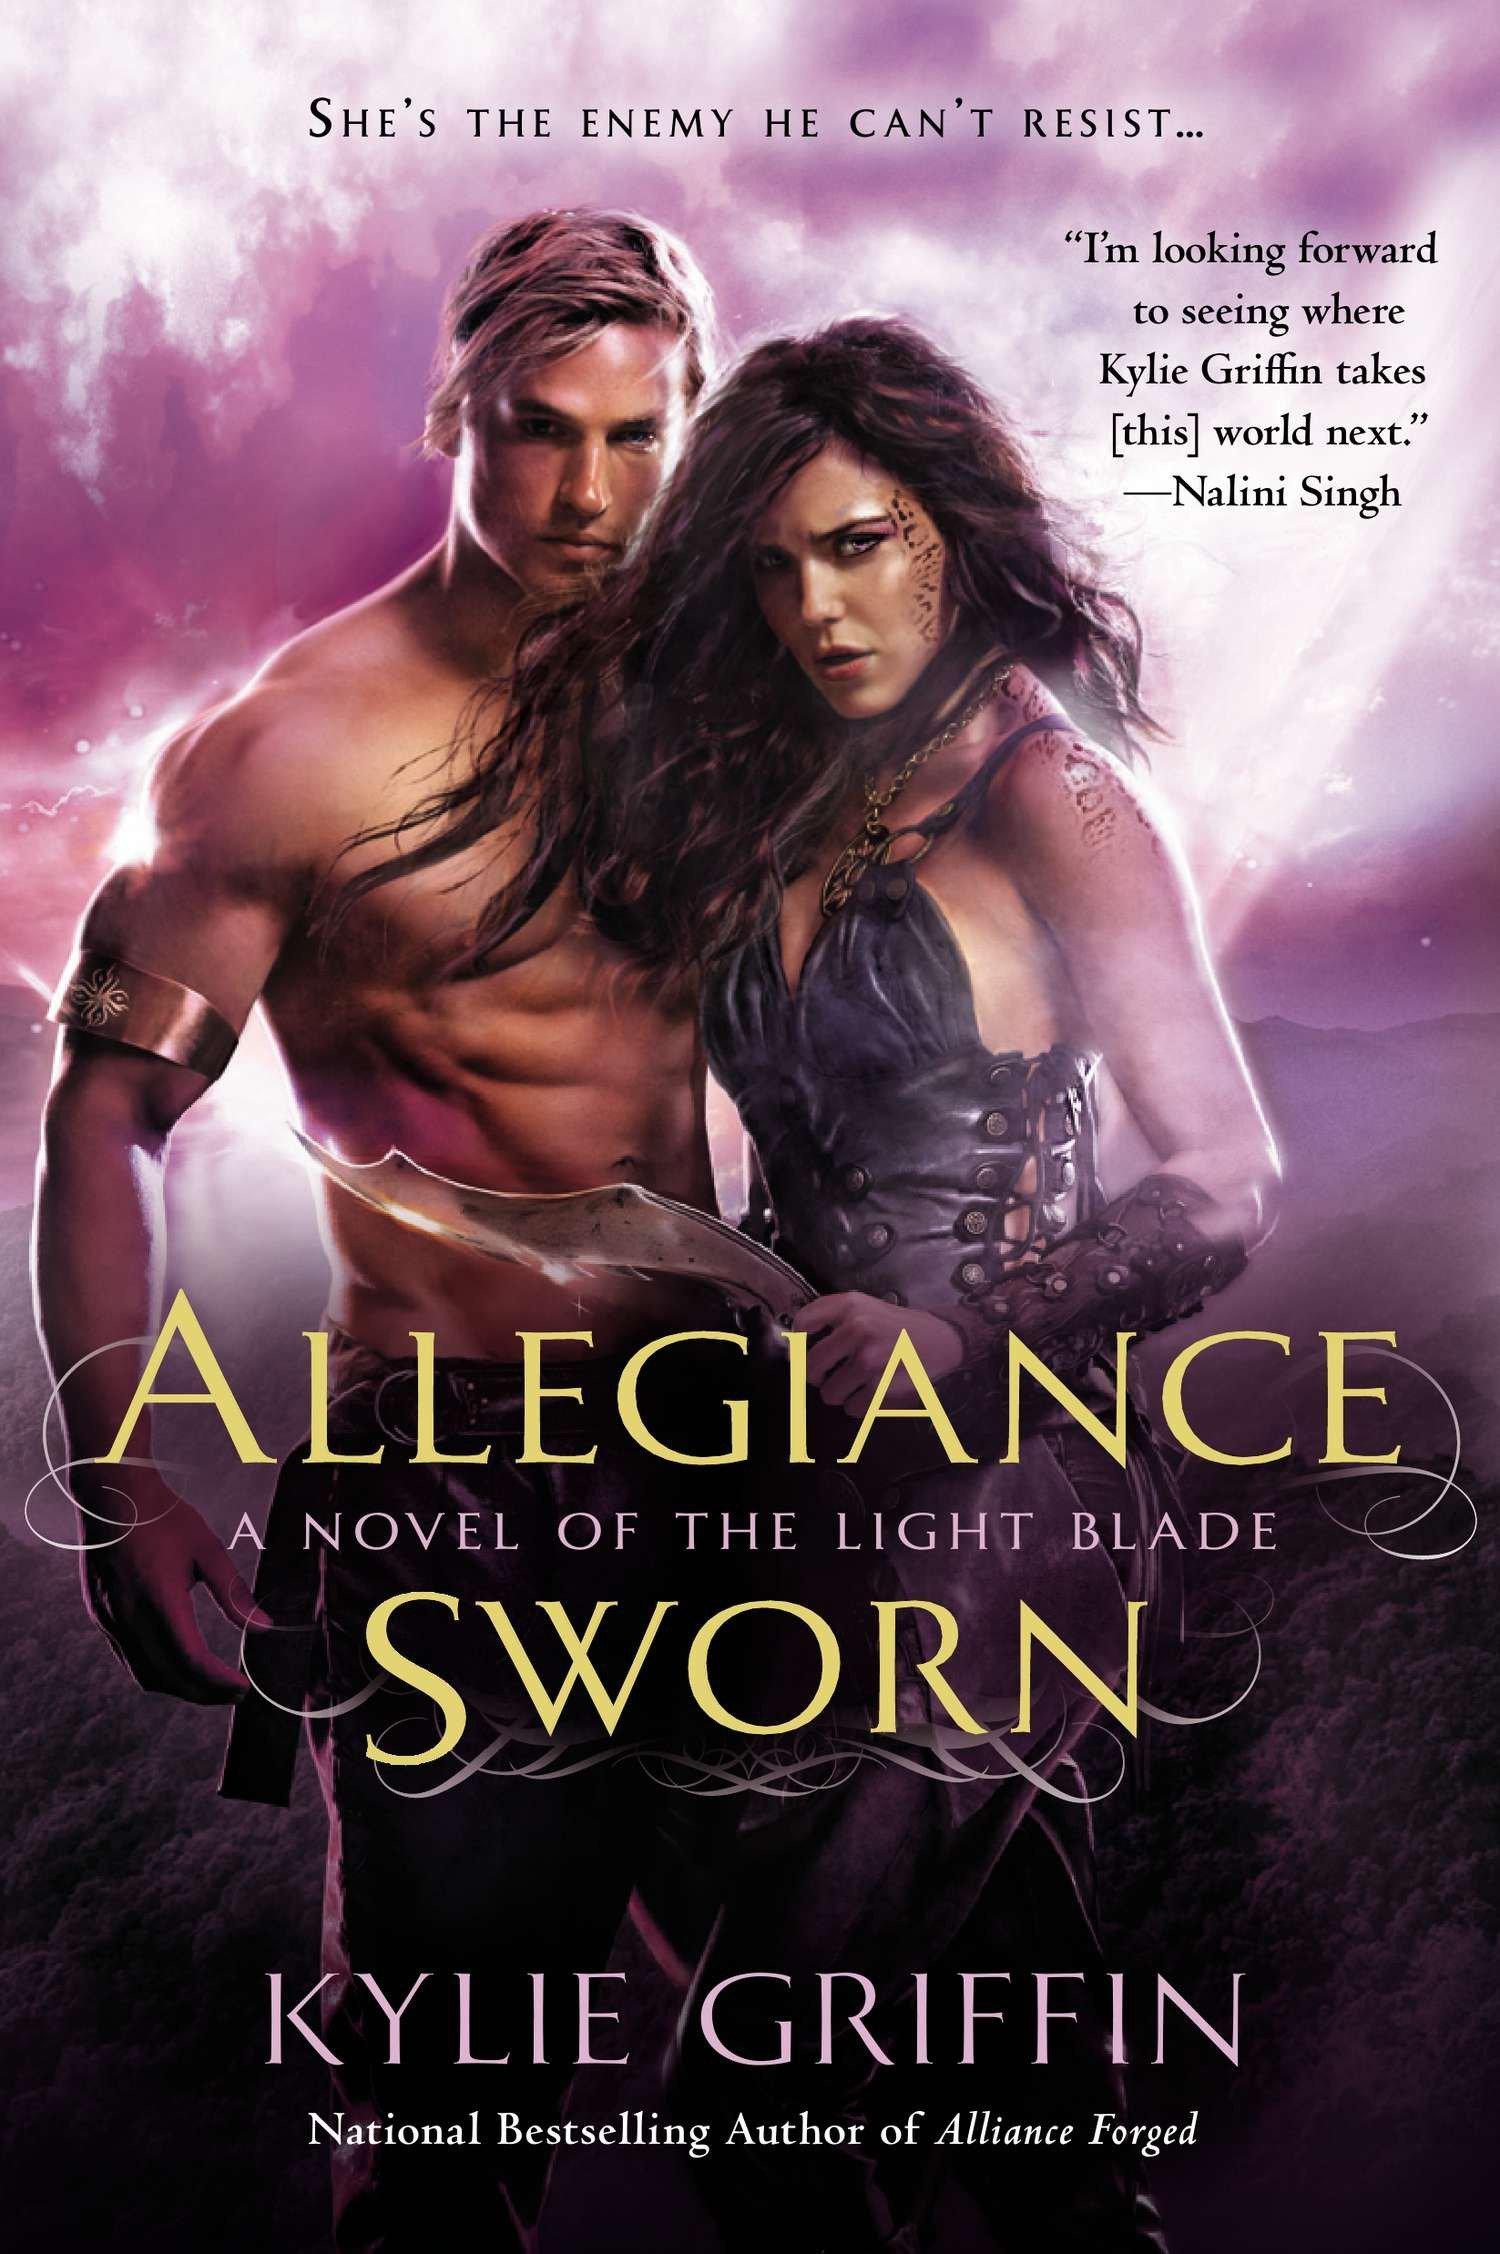 Download Allegiance Sworn (A Novel of the Light Blade) ebook